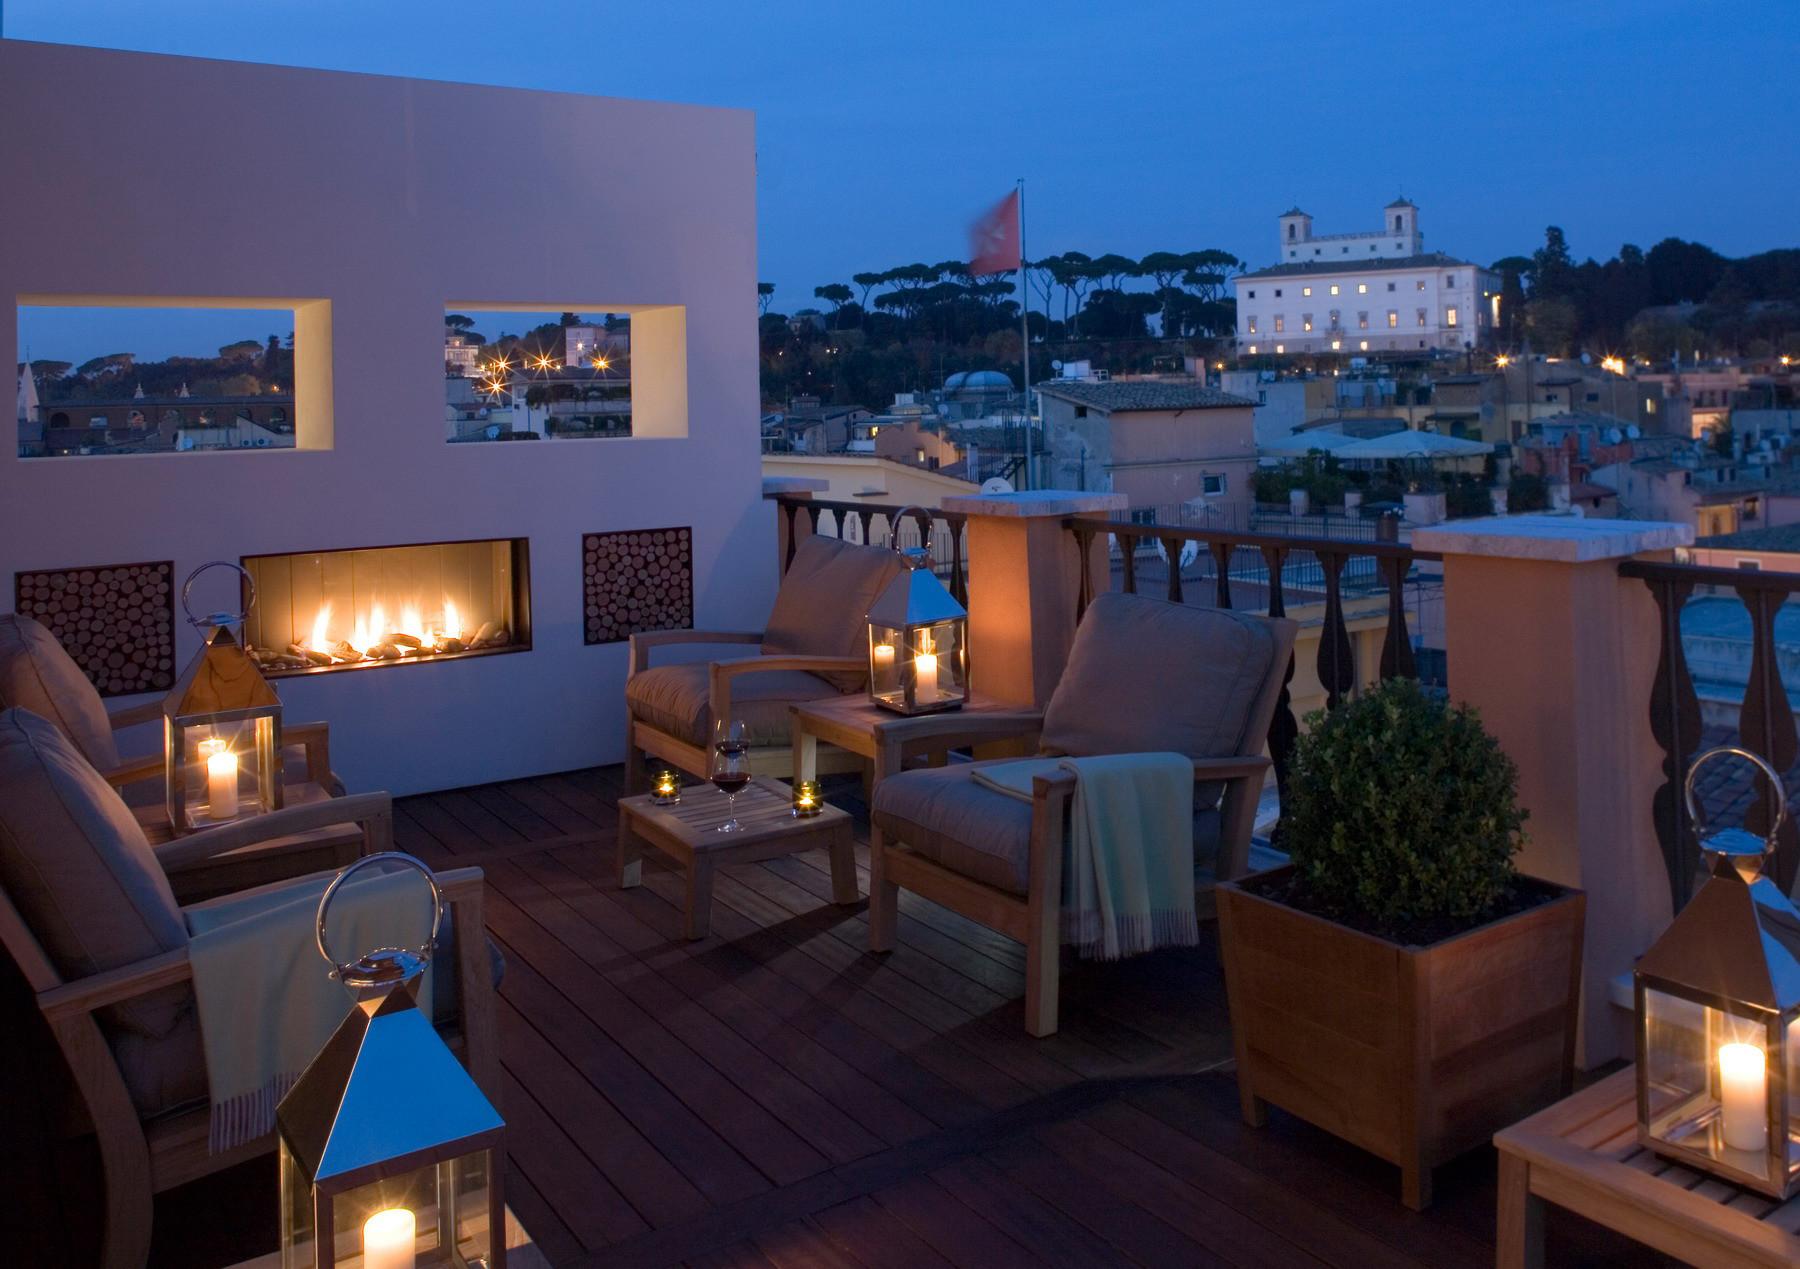 Portrait roma rome luxury hotel italy original travel for Hotel roma rome